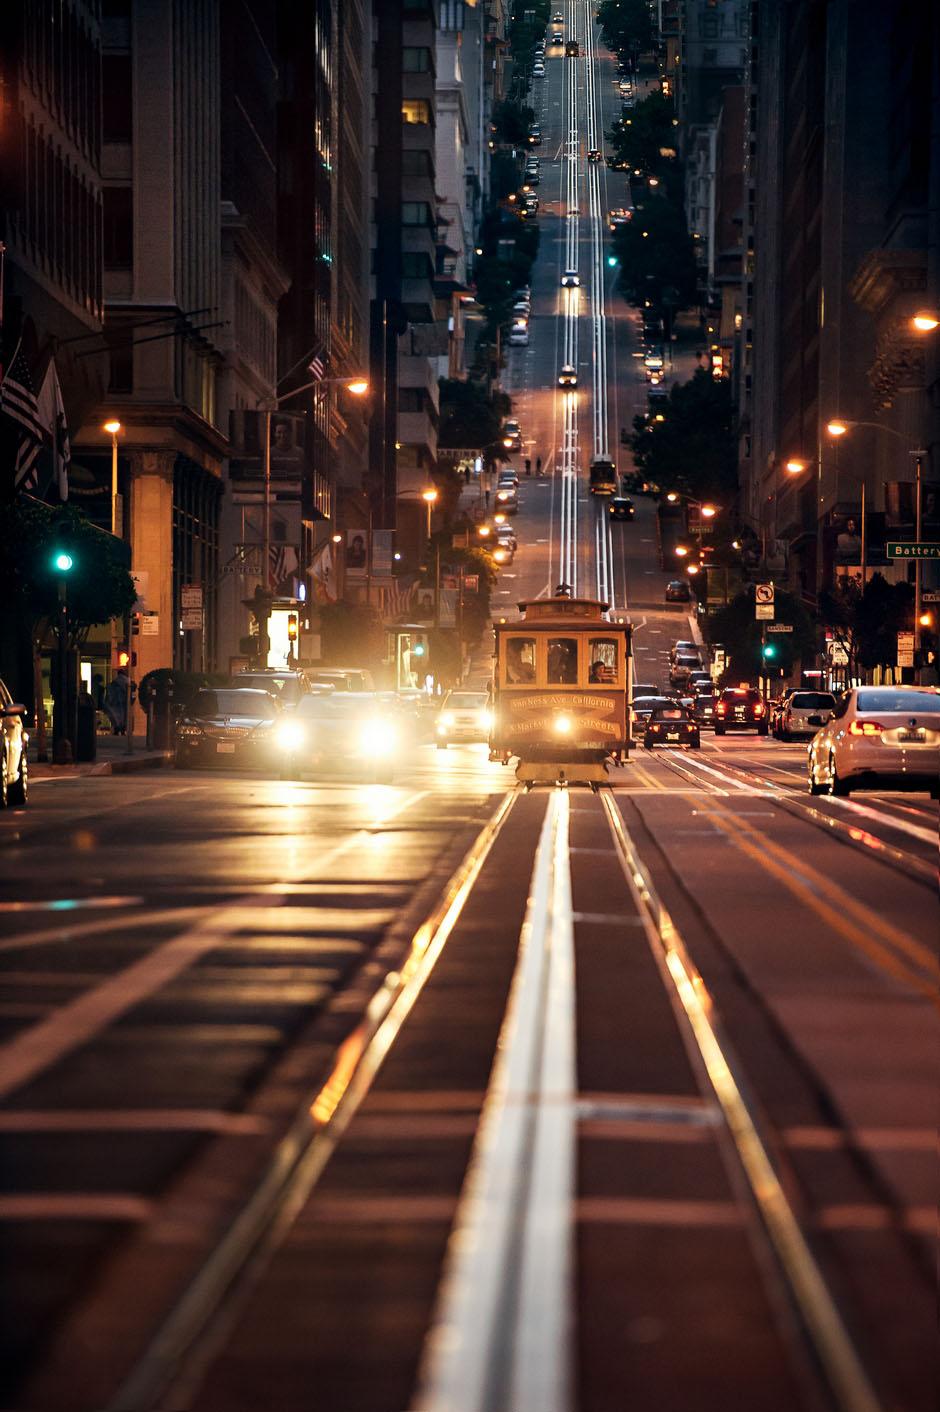 tram sanfrancisco night street